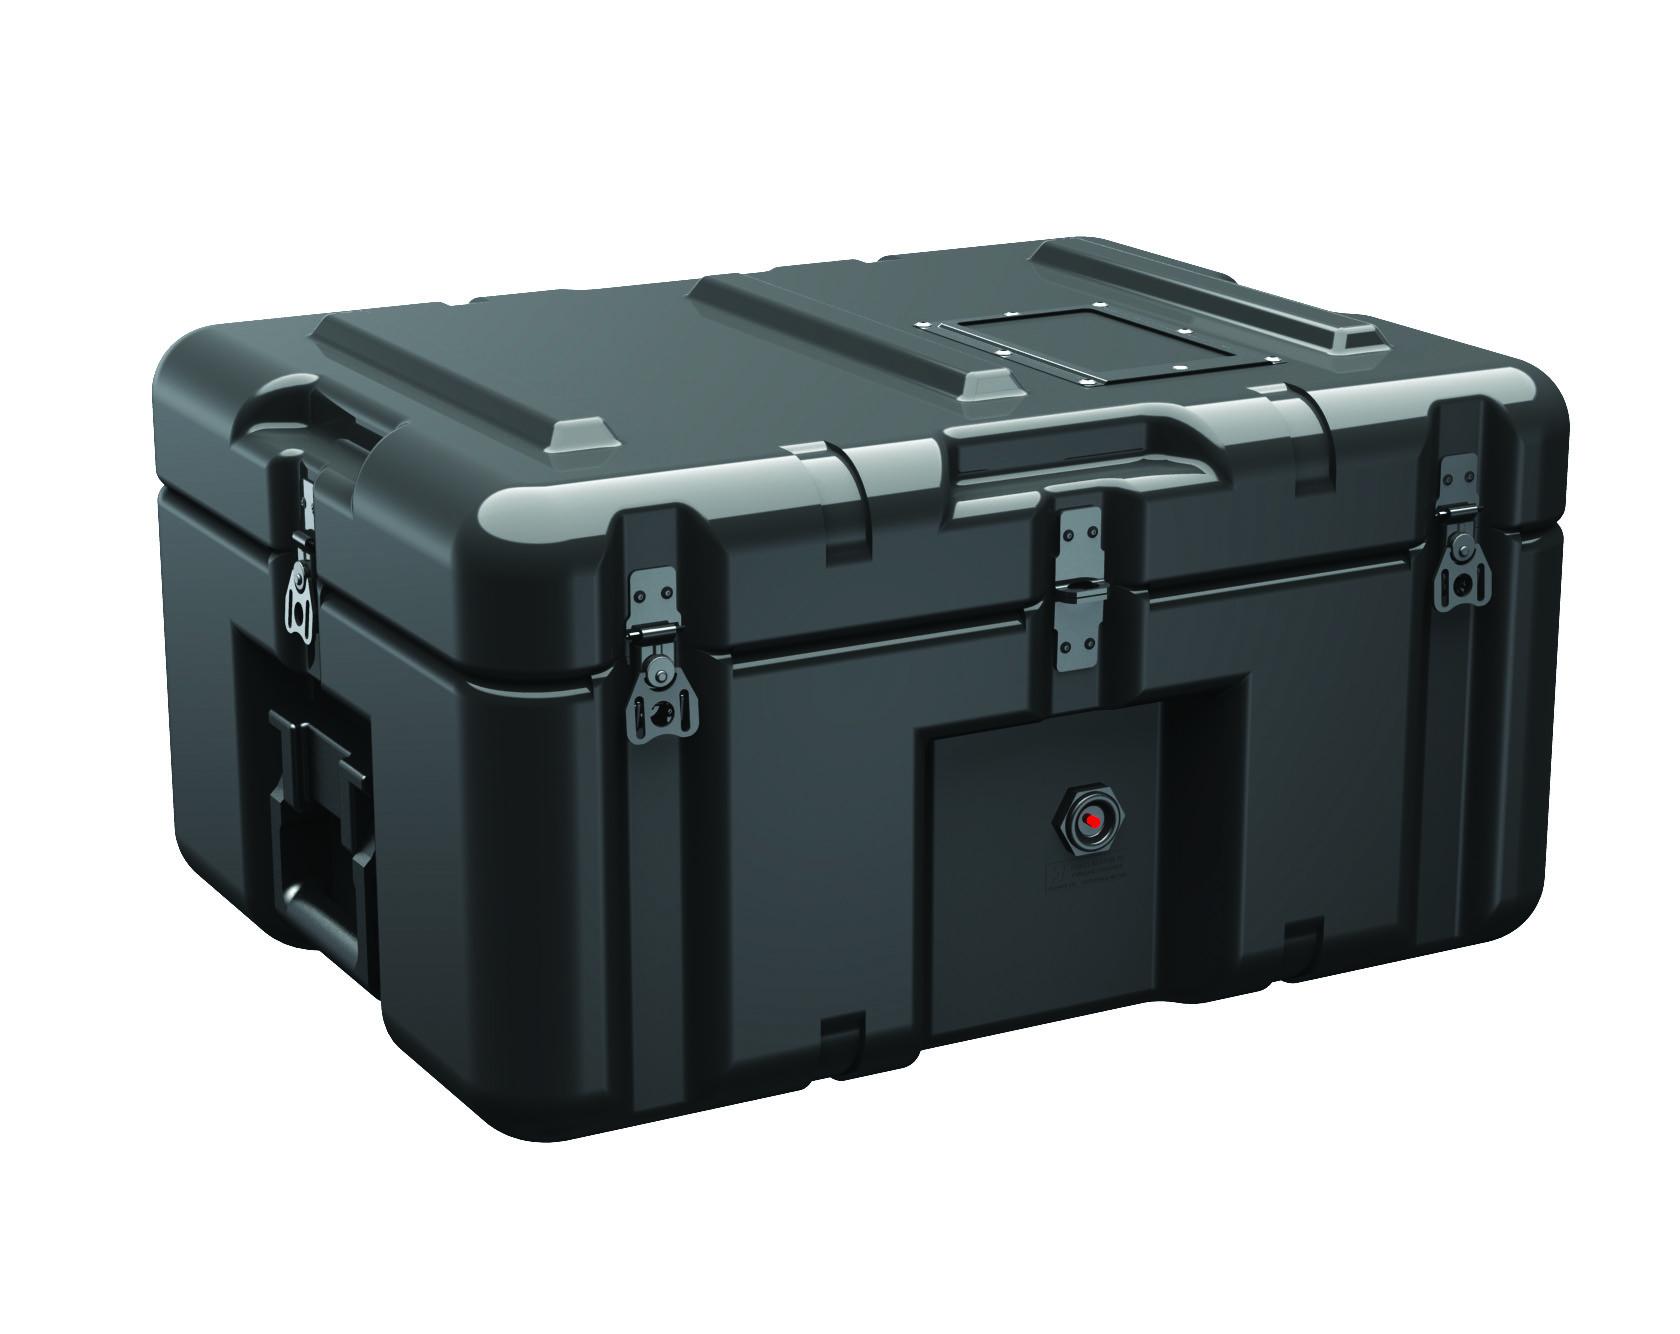 AL2216-0803 - AL2216-0803 Pelican Trunk Case Military Shipping